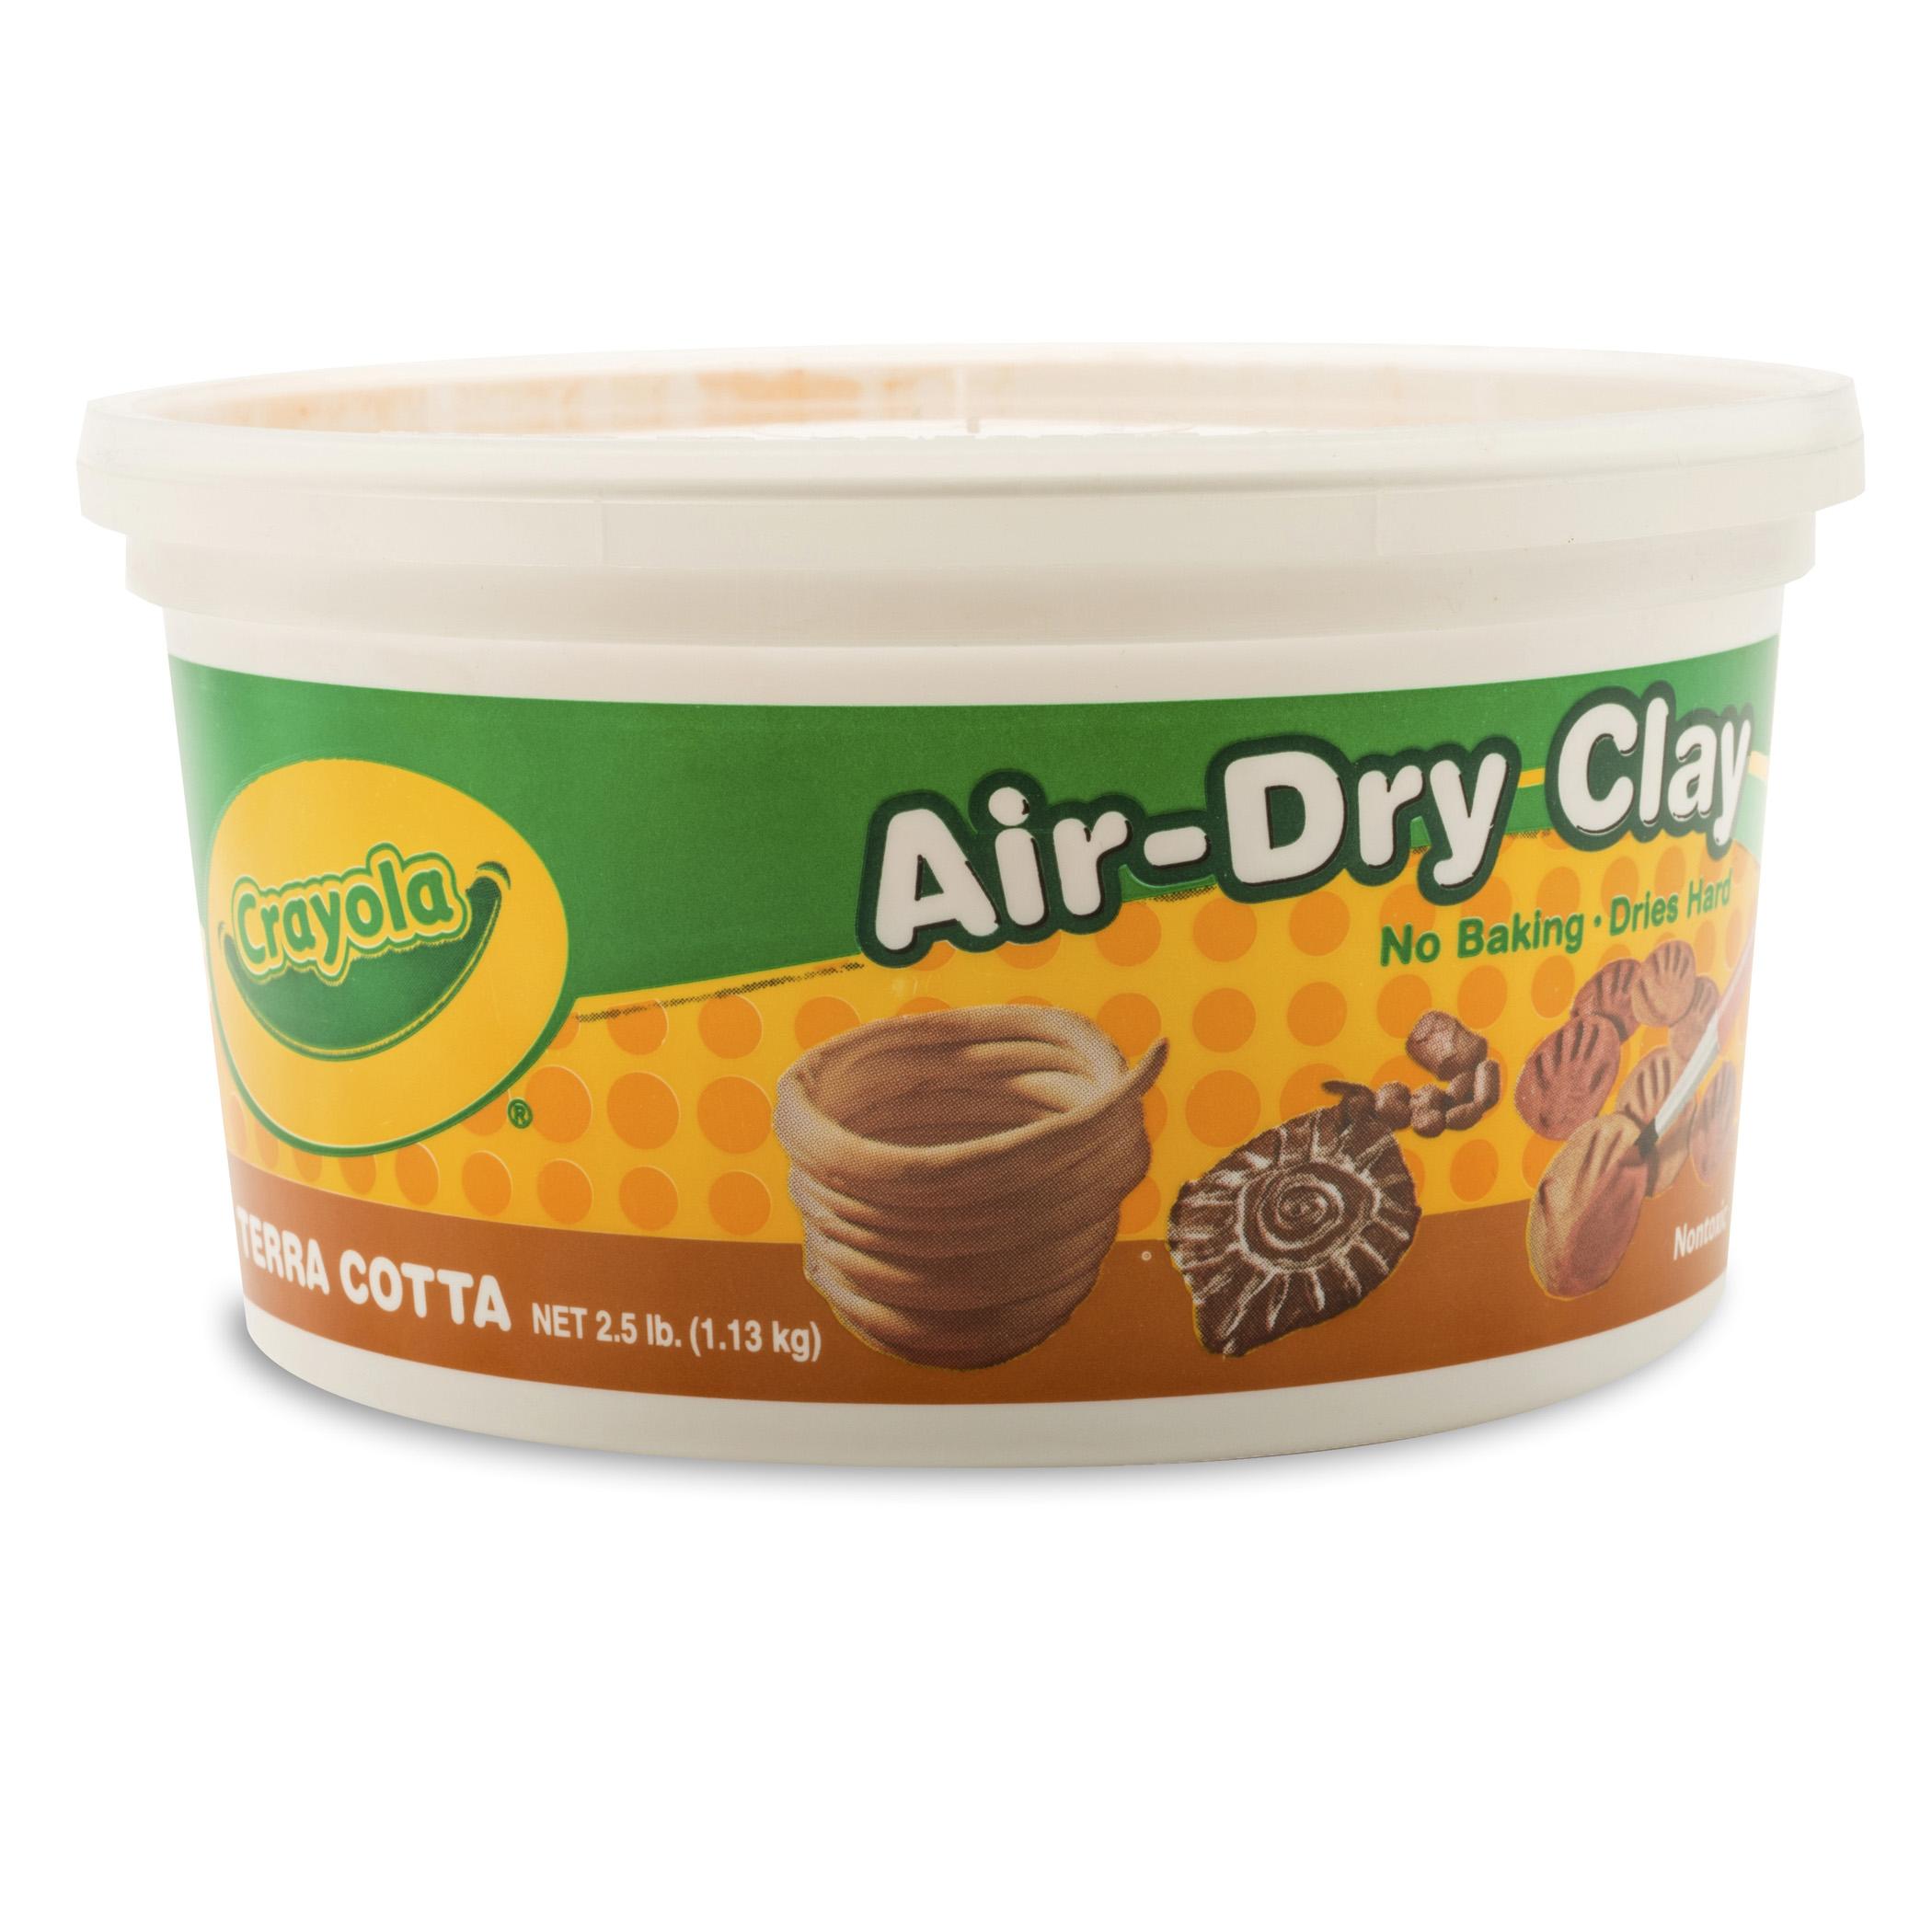 Crayola Air-Dry Clay, Terra Cotta, 25 Lb Per Pack, 4 Packs